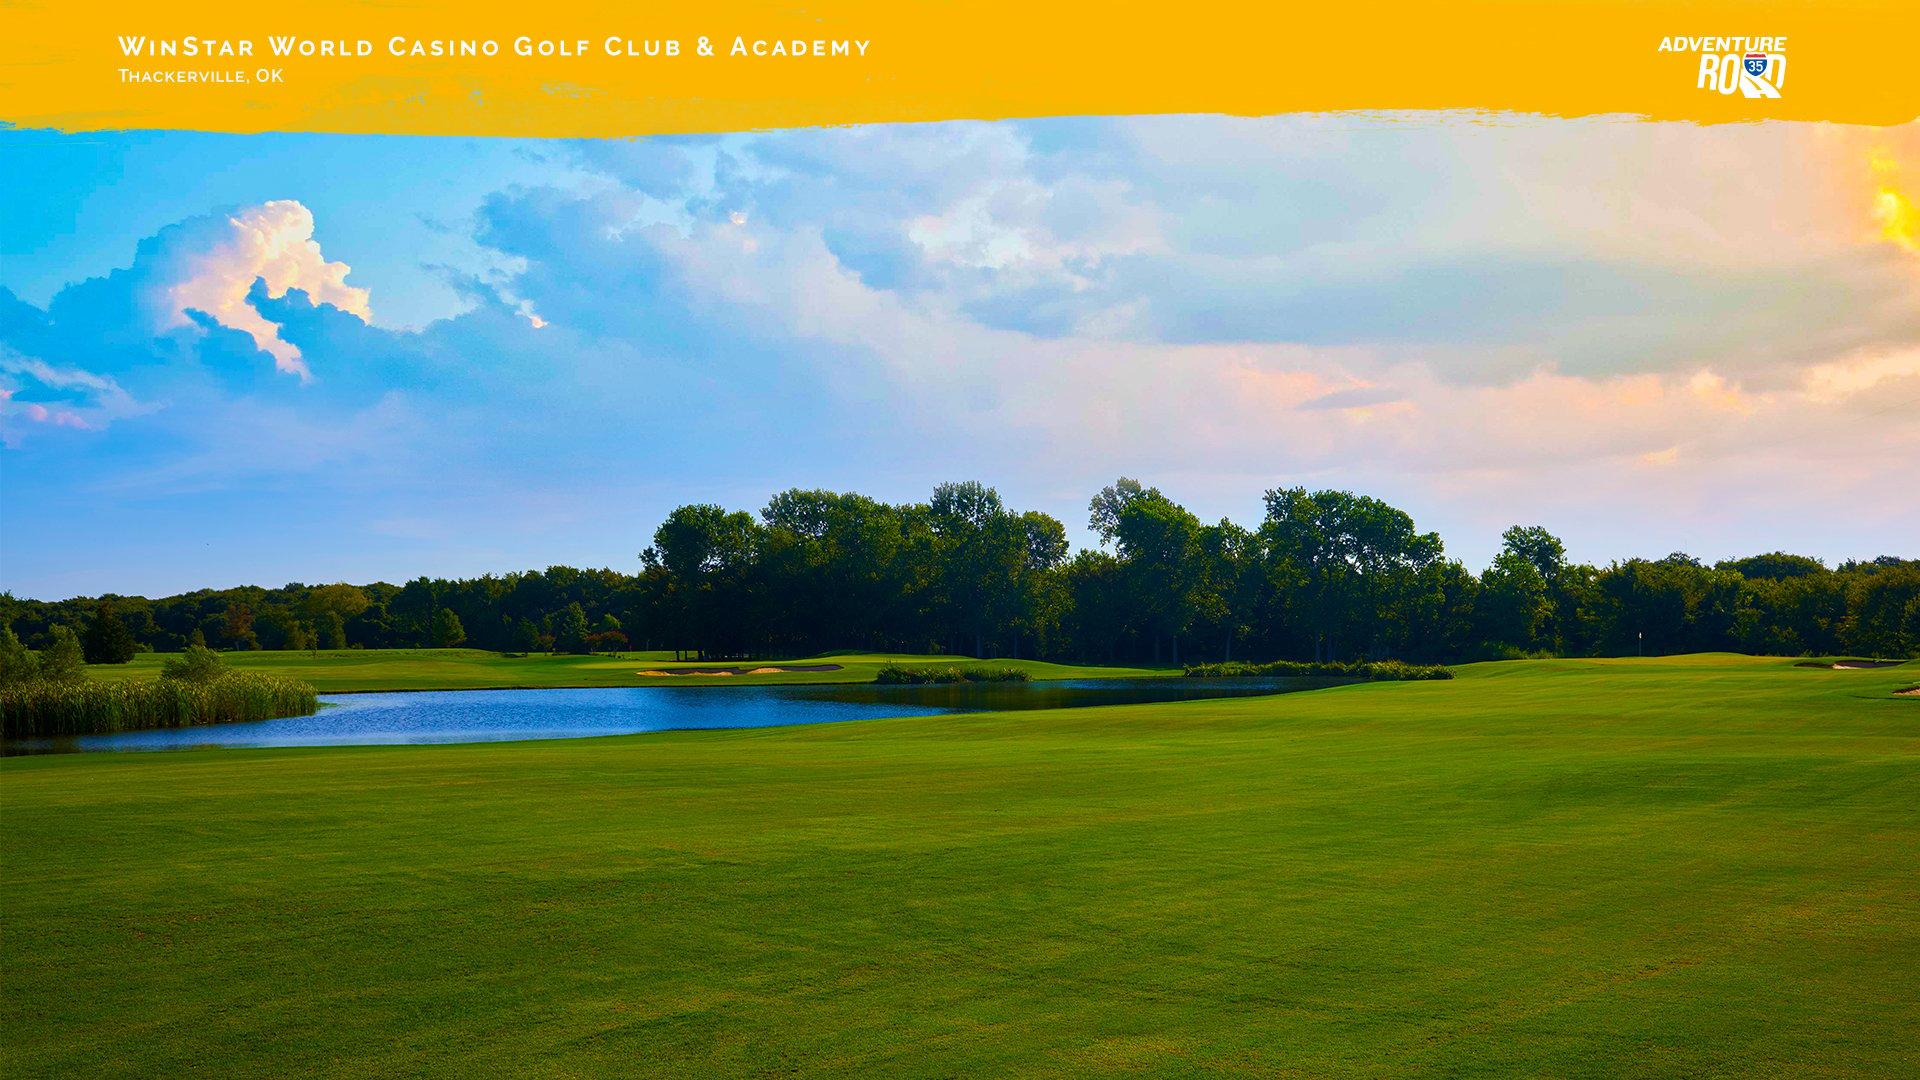 adventure-road-zoom-background-winstar-golf-club-and-acadamy